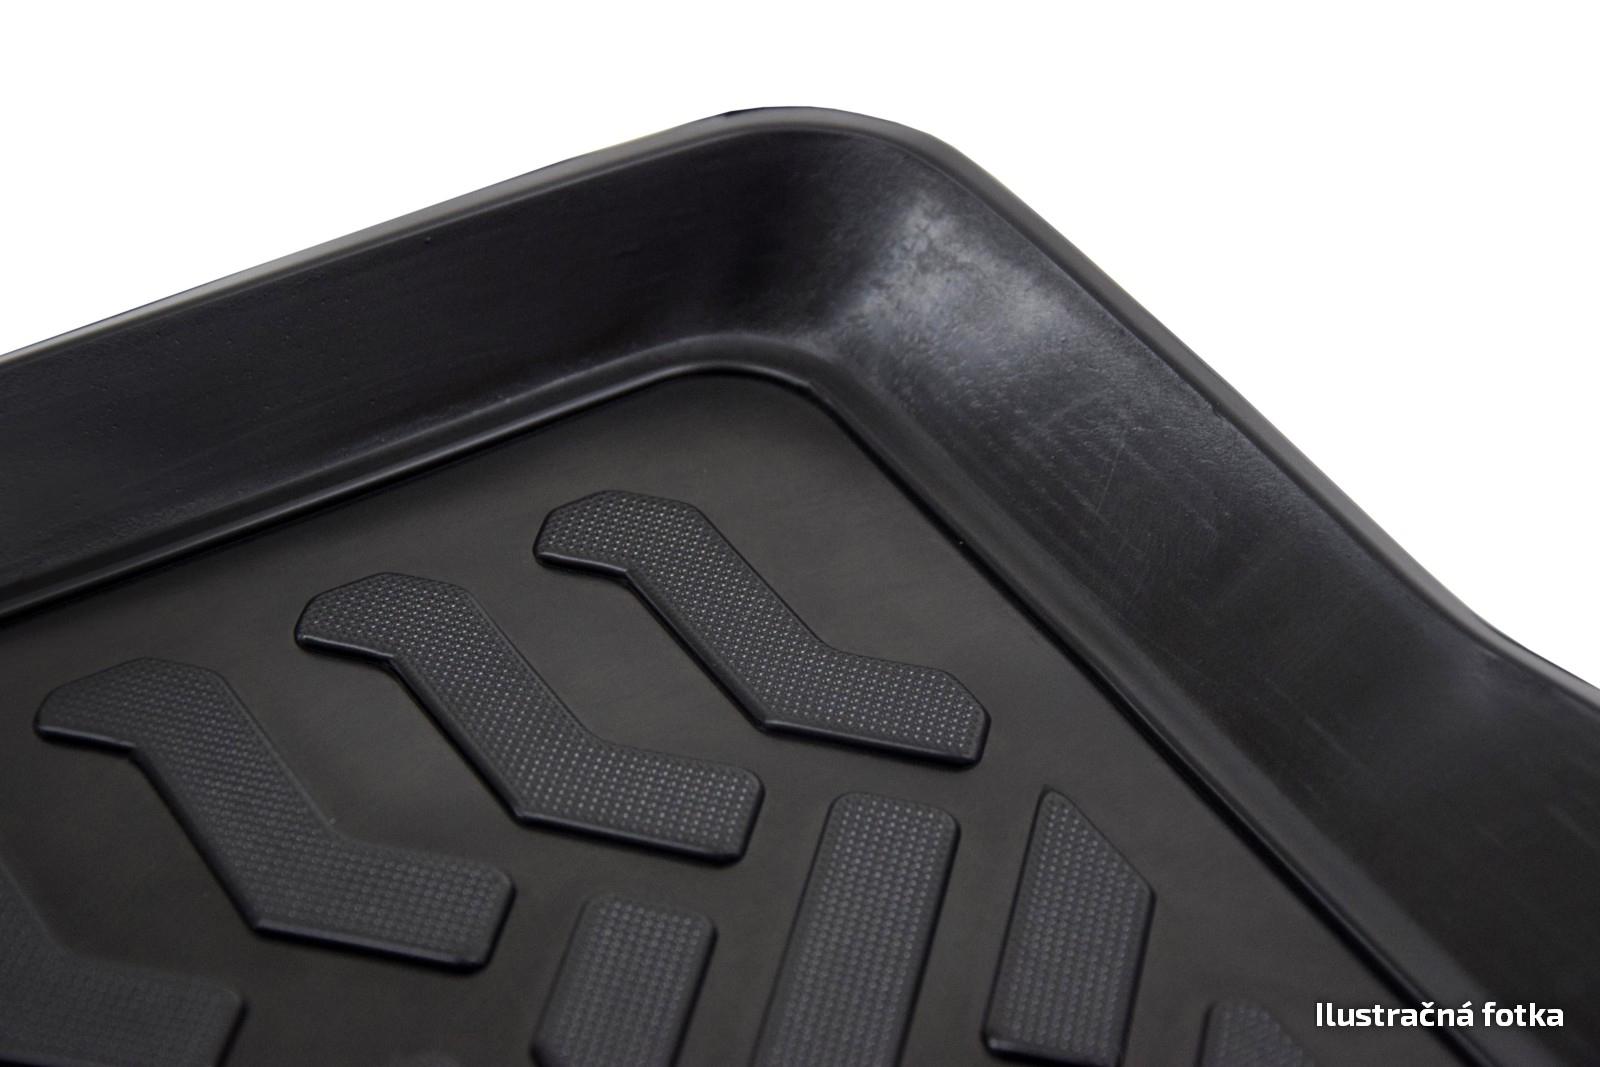 Poza cu Covorase din cauciuc tip tavita Premium, Volkswagen Multivan, 2015-2020